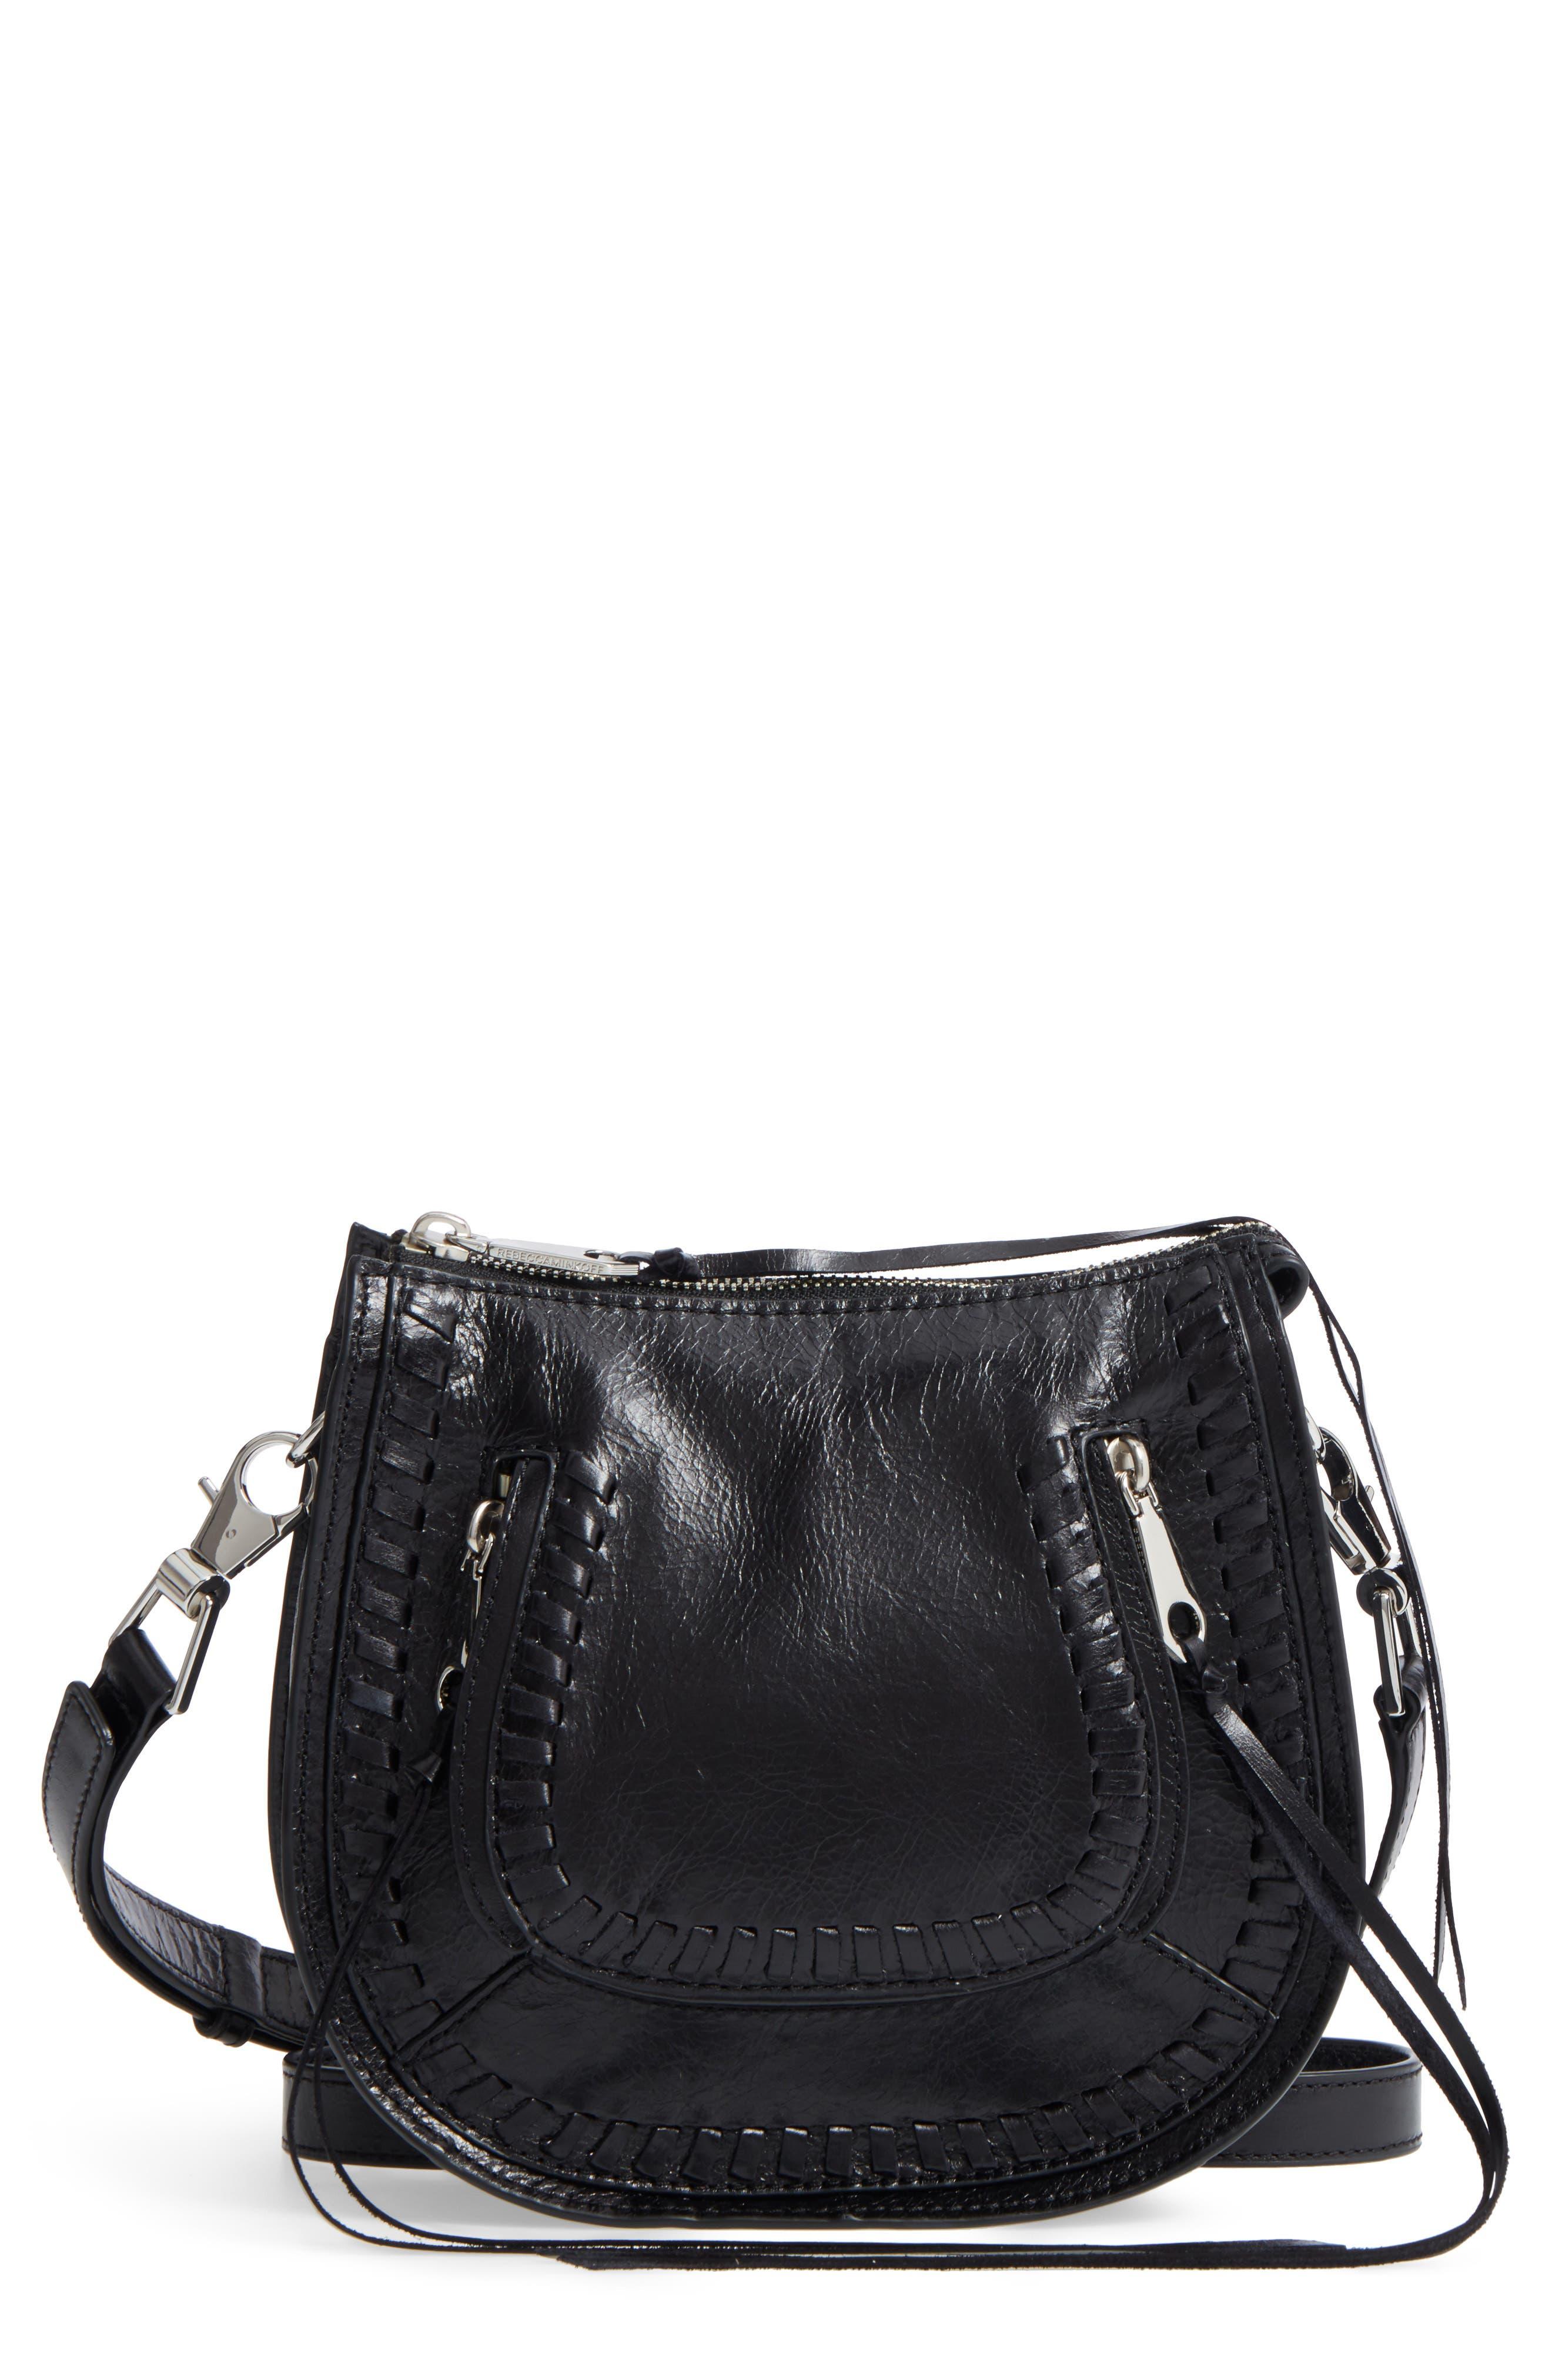 Main Image - Rebecca Minkoff Mini Vanity Leather Saddle Bag